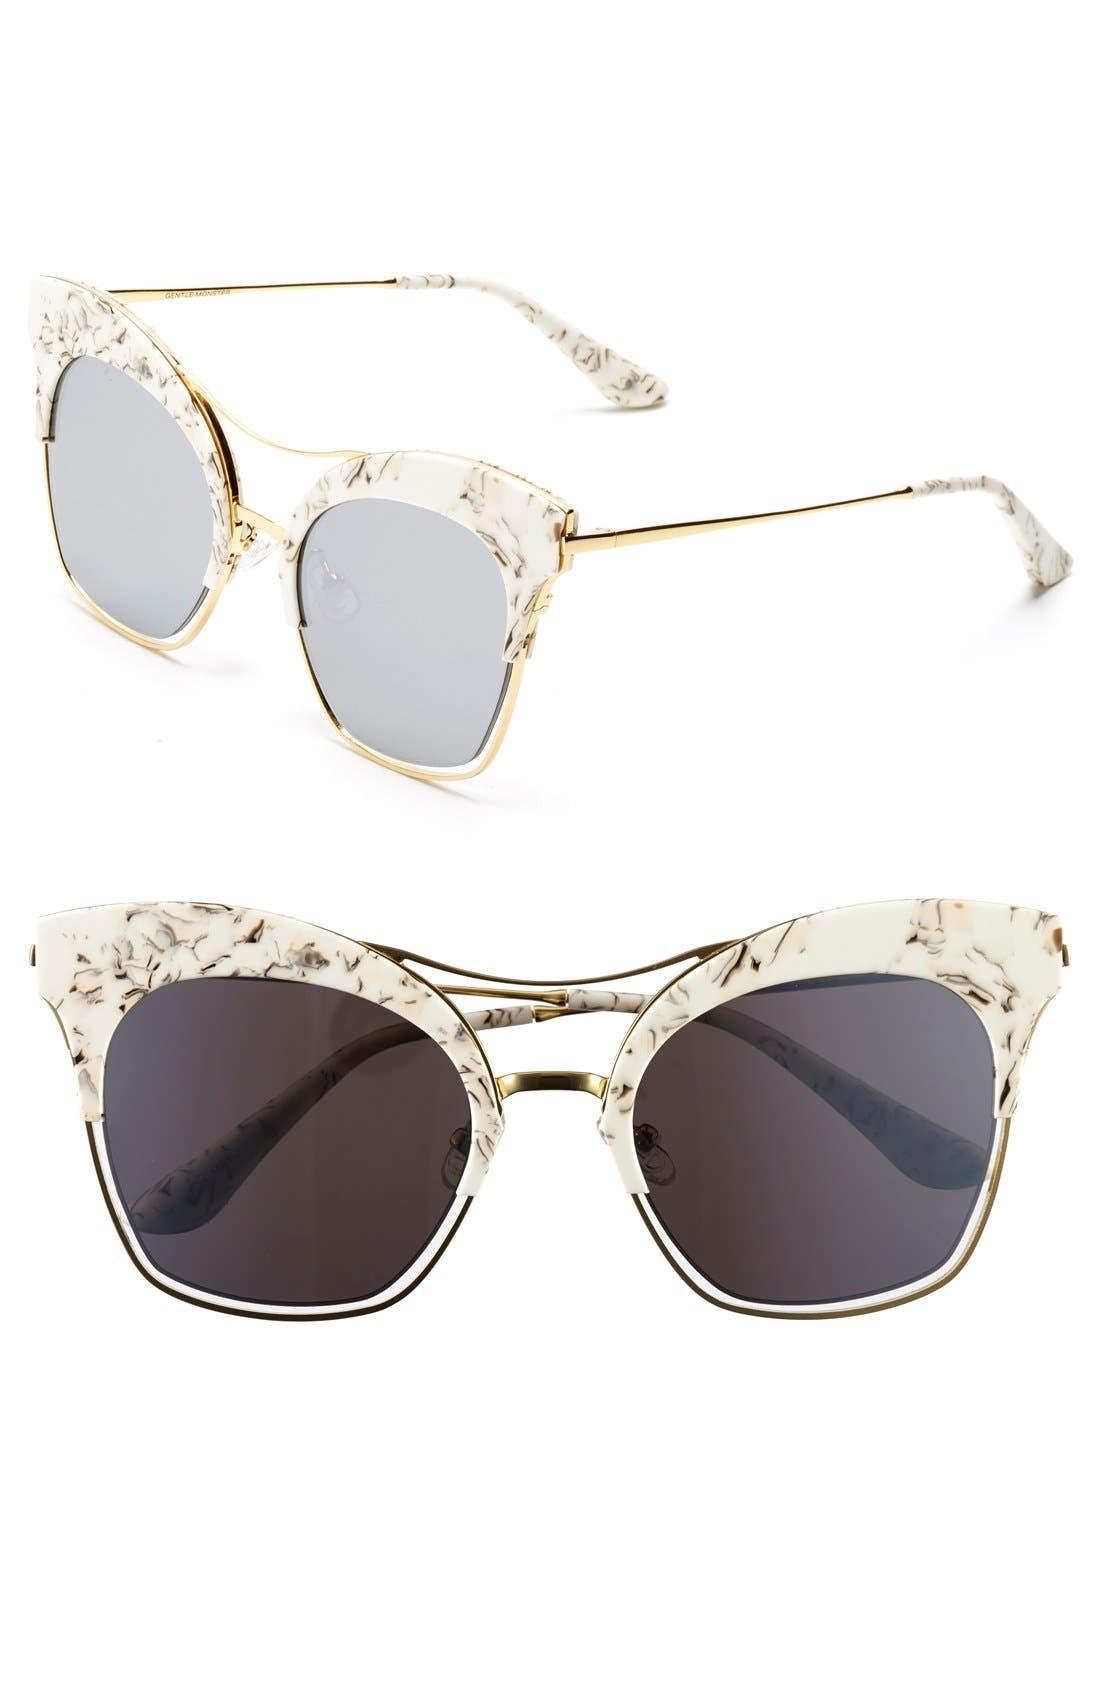 Main Image - Gentle Monster 54mm Cat Eye Sunglasses